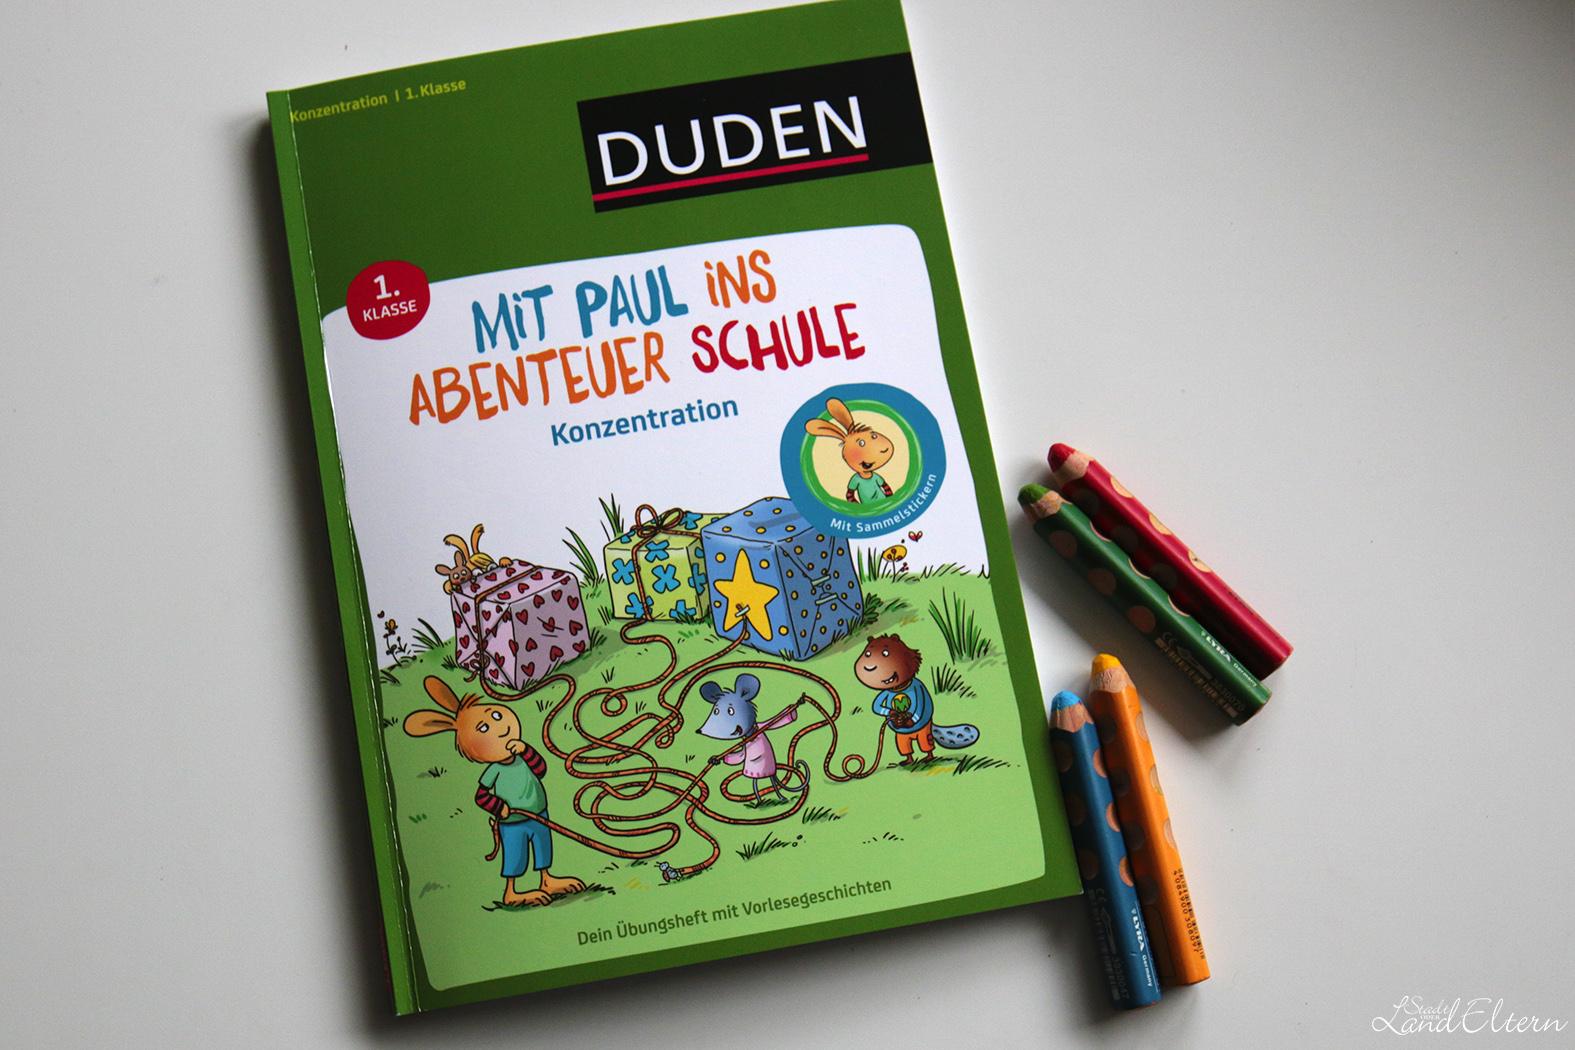 Duden: Mit Paul ins Abenteuer Schule